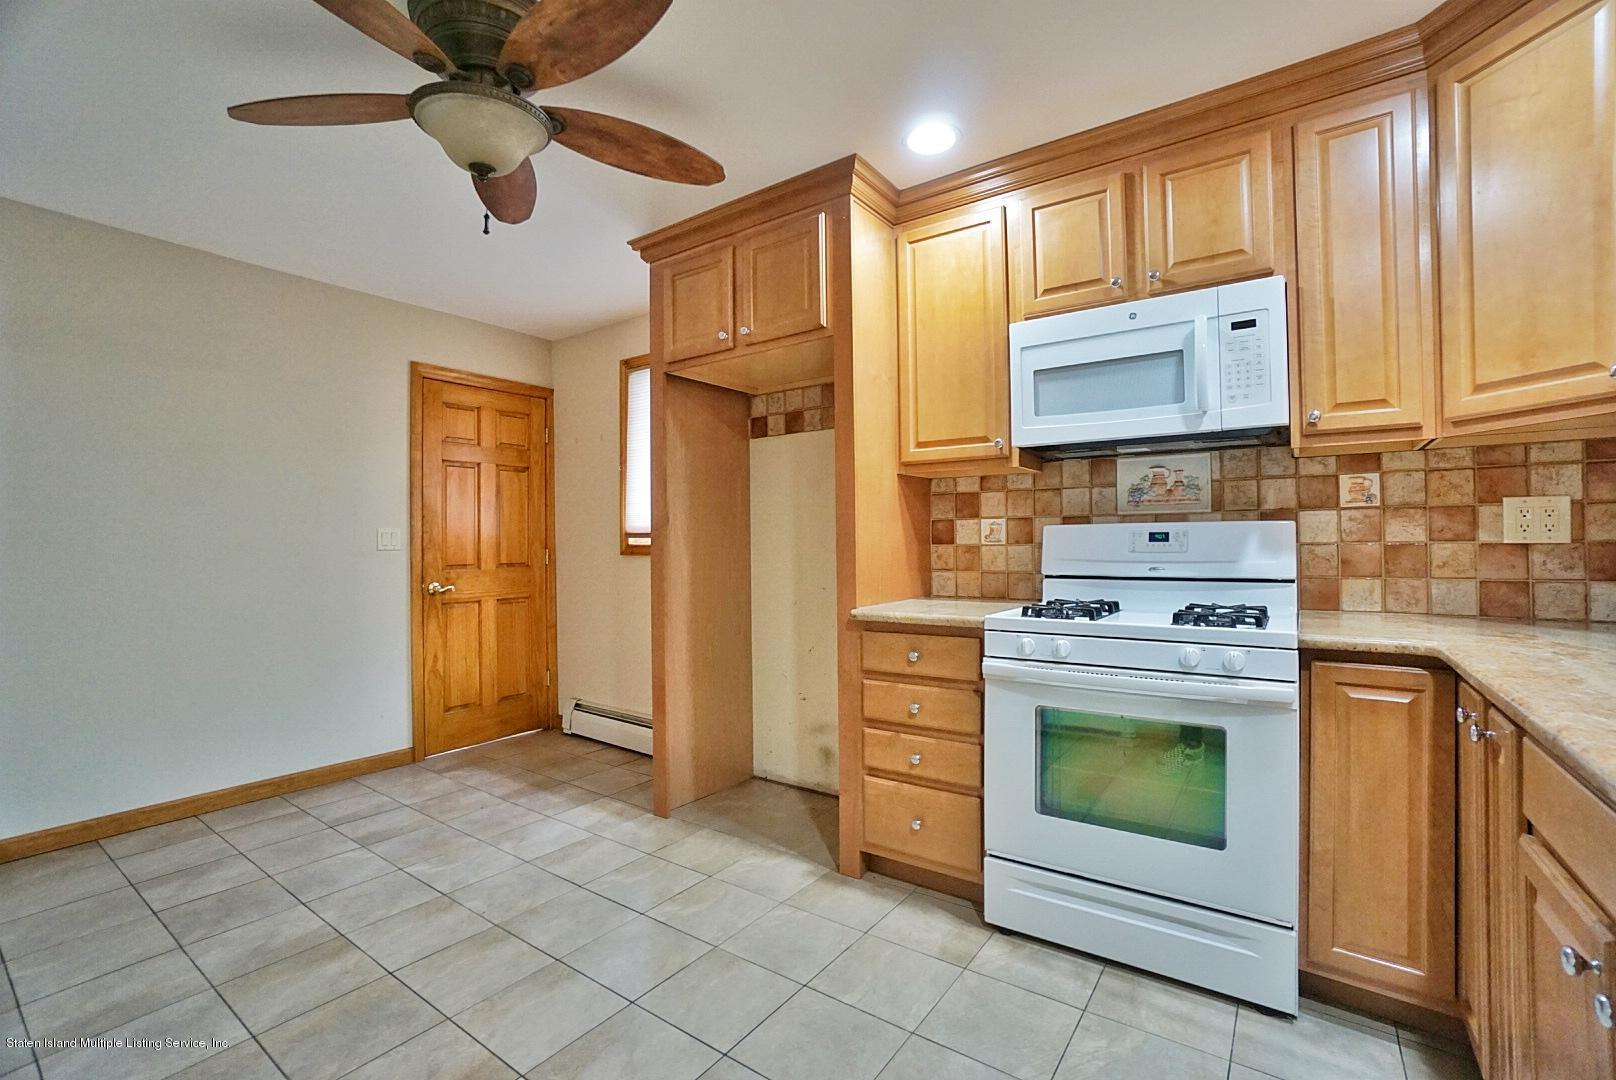 Single Family - Detached 55 Lyndale Avenue  Staten Island, NY 10312, MLS-1128769-5